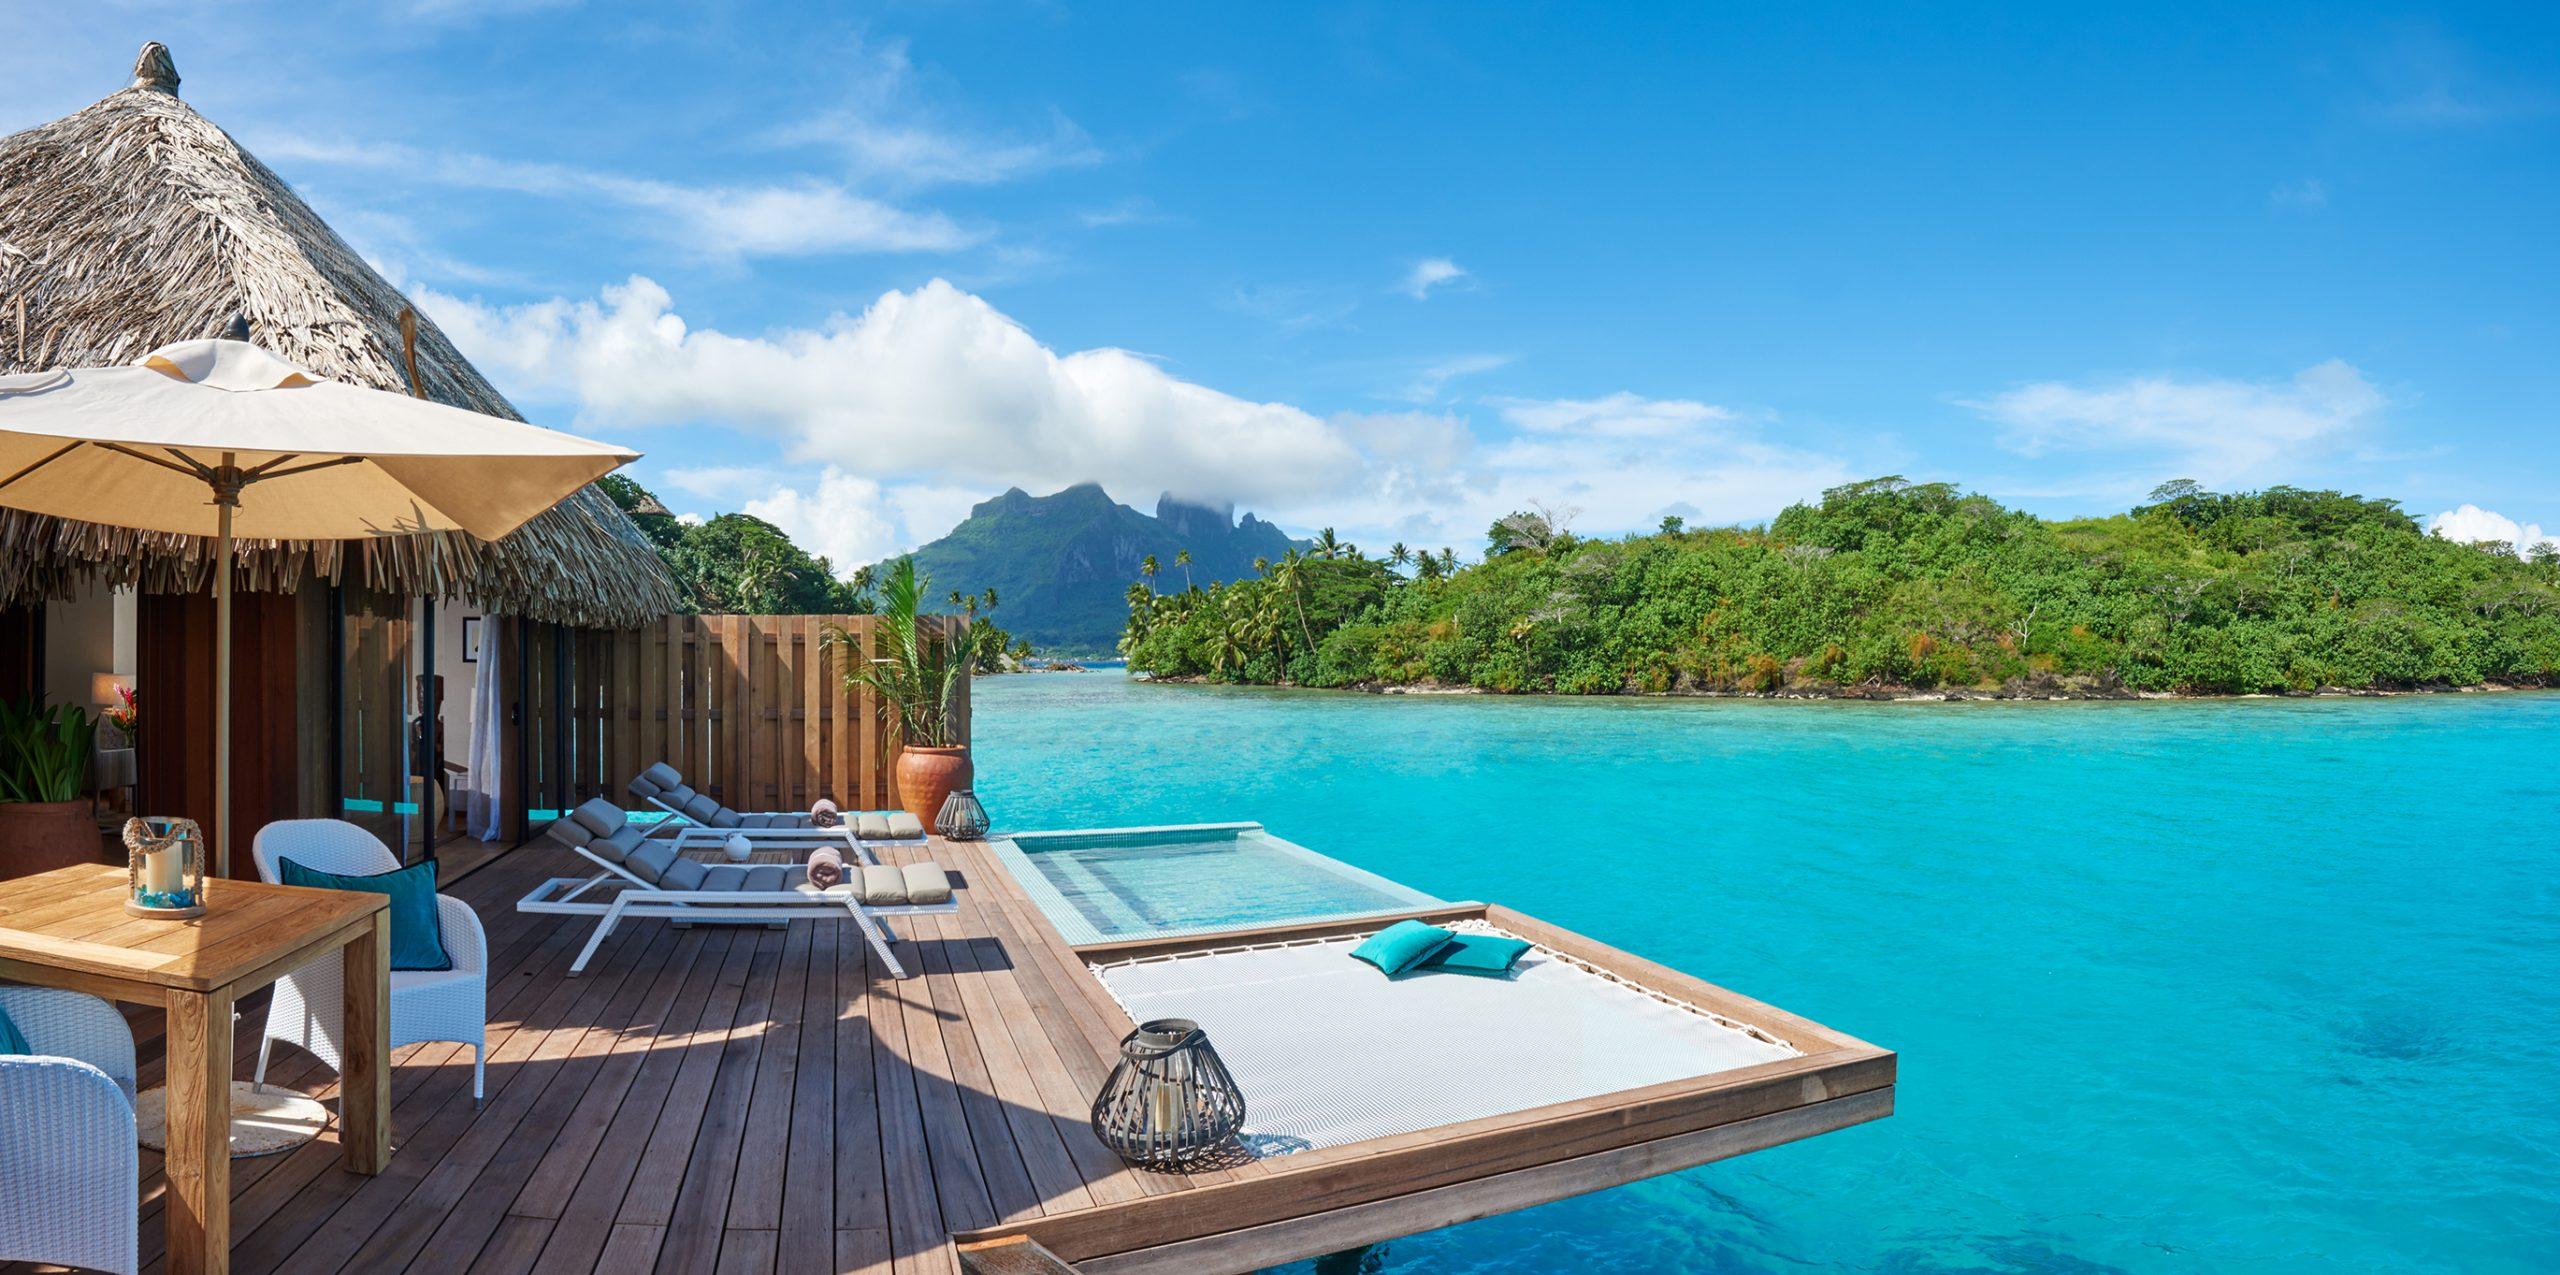 Royal Pool Overwater Villa Conrad Bora Bora Nui